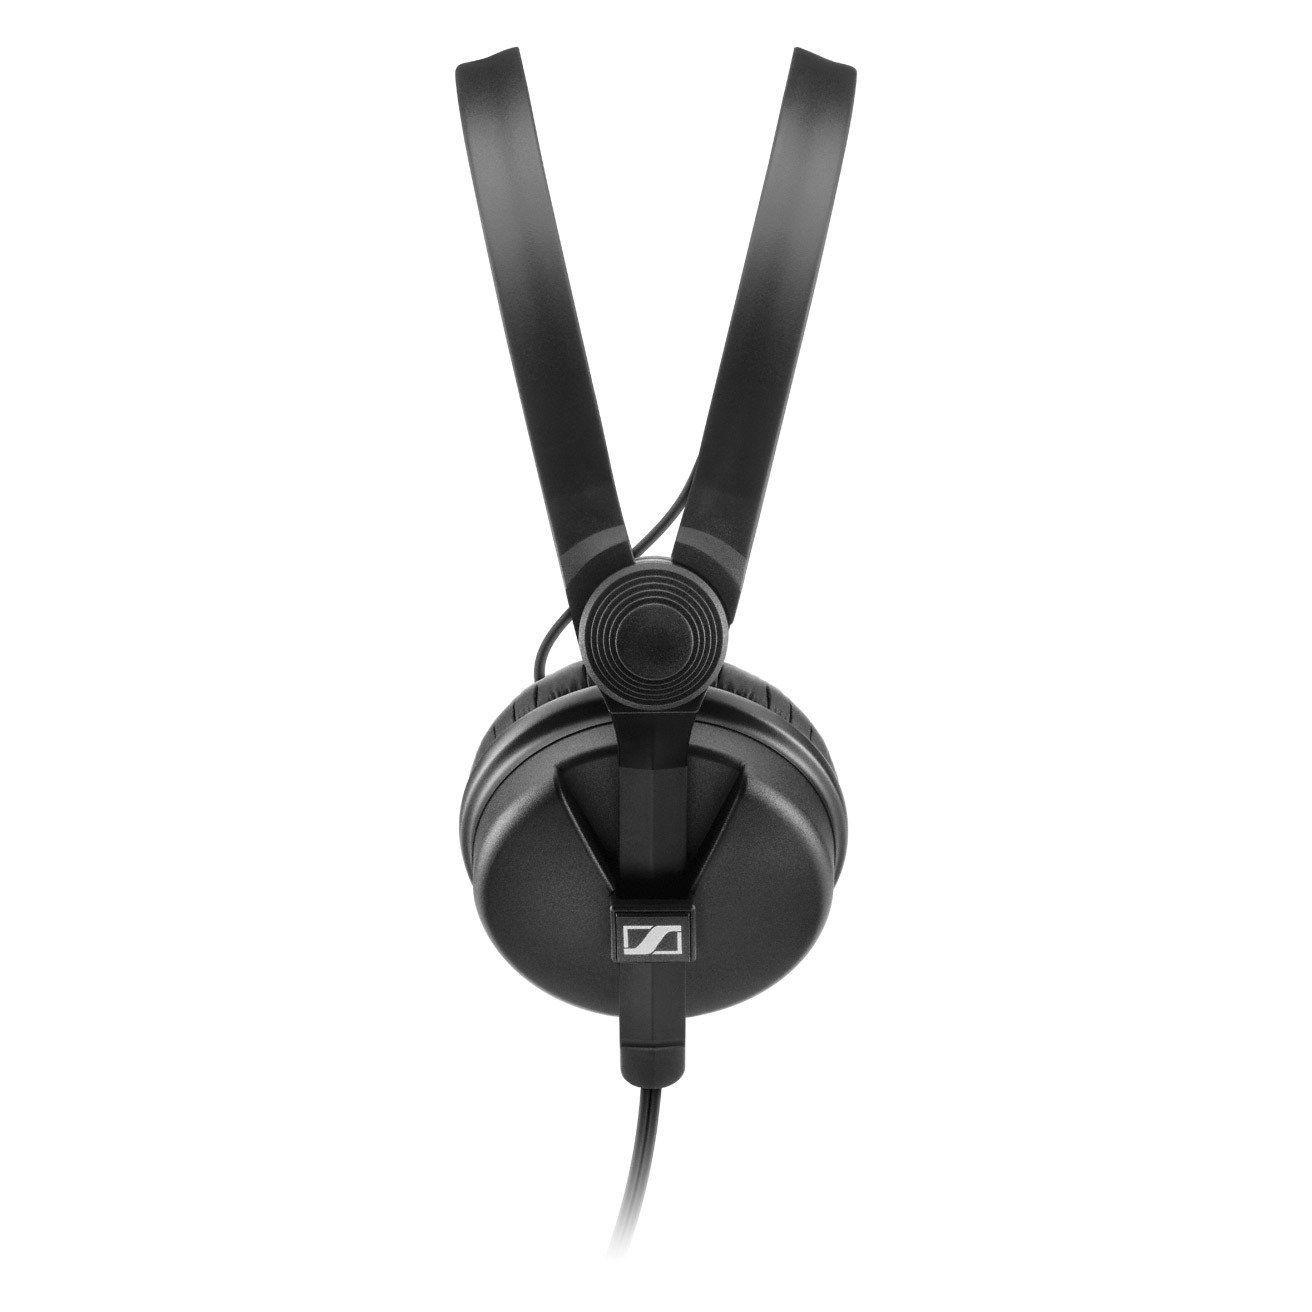 Sennheiser HD25 Fone de Ouvido HD-25 Profissional Ideal para DJs Estúdio e Cameraman